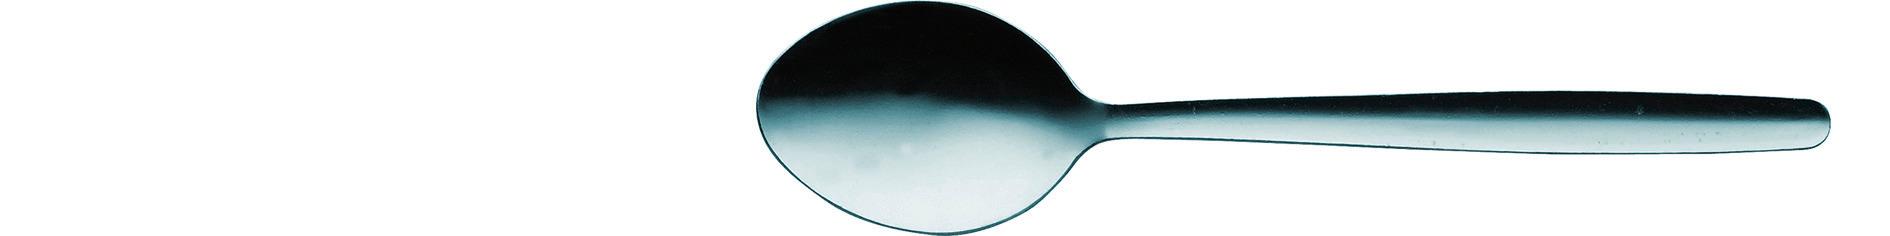 Menülöffel 188 mm